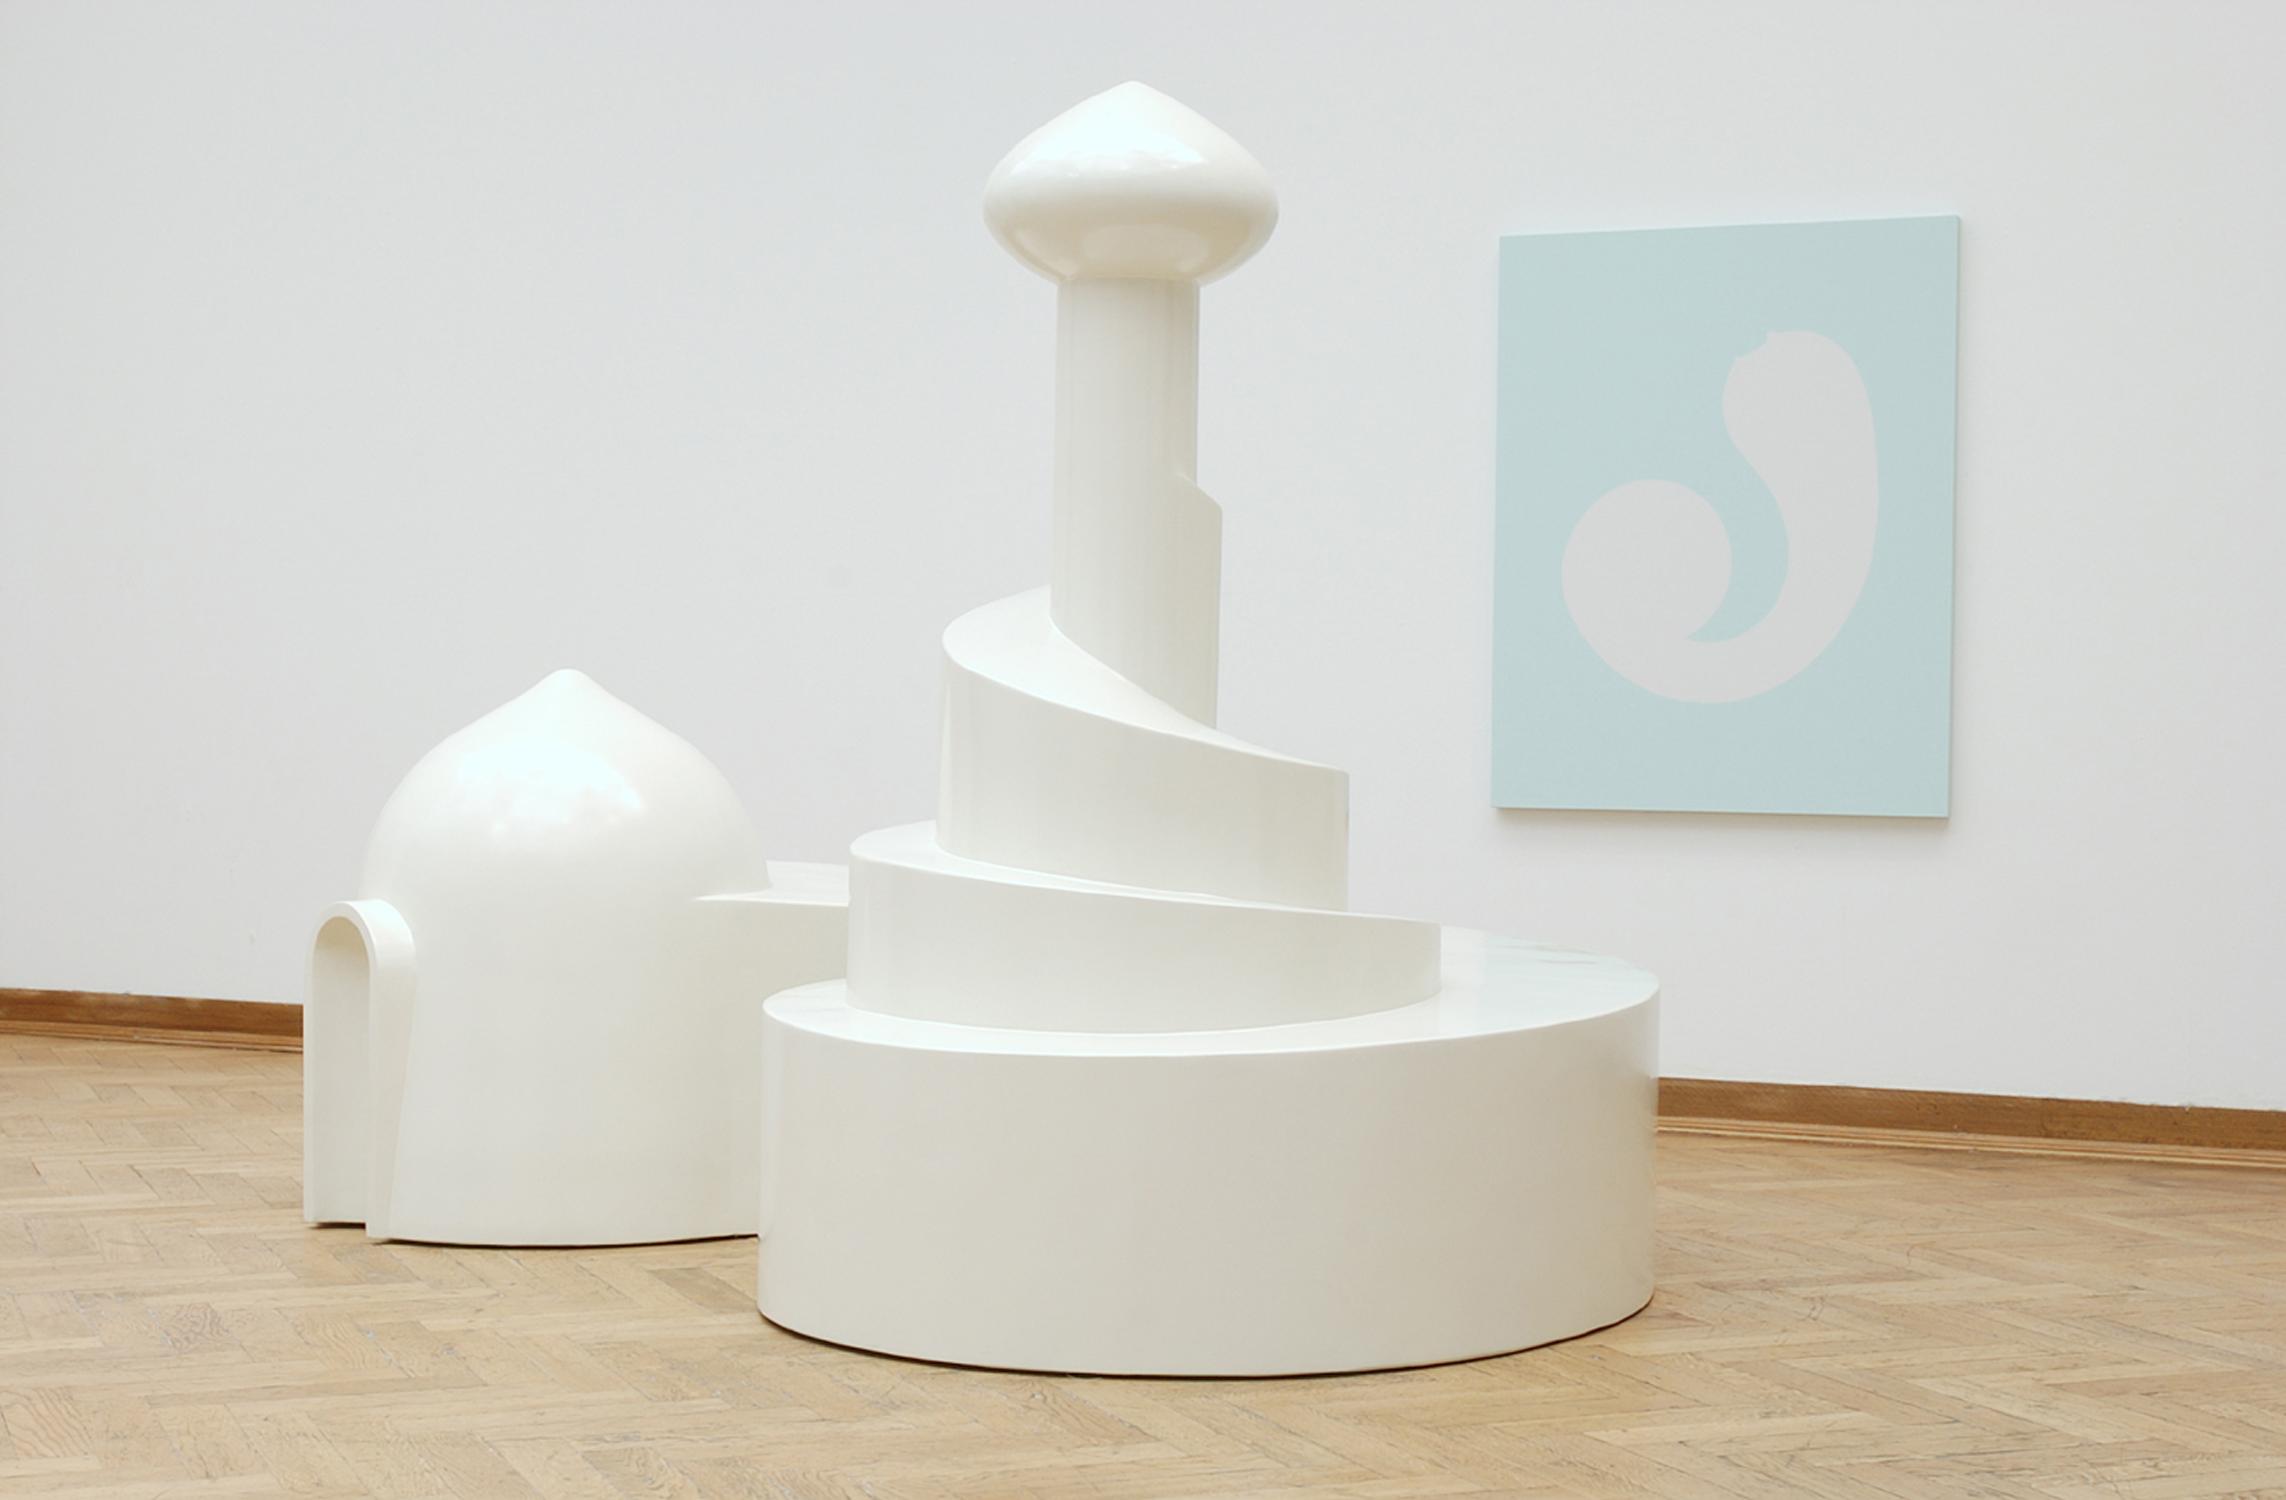 "Untitled (Industrial Harem), 2003. Installation view, Transferts,Palais des Beaux-Arts, Brussels, Belgium                                Normal    0                false    false    false       EN-US    JA    X-NONE                                                                                                                                                                                                                                                                                                                                                                                                                                                                                                                                                  /* Style Definitions */ table.MsoNormalTable {mso-style-name:""Table Normal""; mso-tstyle-rowband-size:0; mso-tstyle-colband-size:0; mso-style-noshow:yes; mso-style-priority:99; mso-style-parent:""""; mso-padding-alt:0in 5.4pt 0in 5.4pt; mso-para-margin:0in; mso-para-margin-bottom:.0001pt; mso-pagination:widow-orphan; font-size:12.0pt; font-family:Cambria; mso-ascii-font-family:Cambria; mso-ascii-theme-font:minor-latin; mso-hansi-font-family:Cambria; mso-hansi-theme-font:minor-latin; mso-ansi-language:EN-US;}"